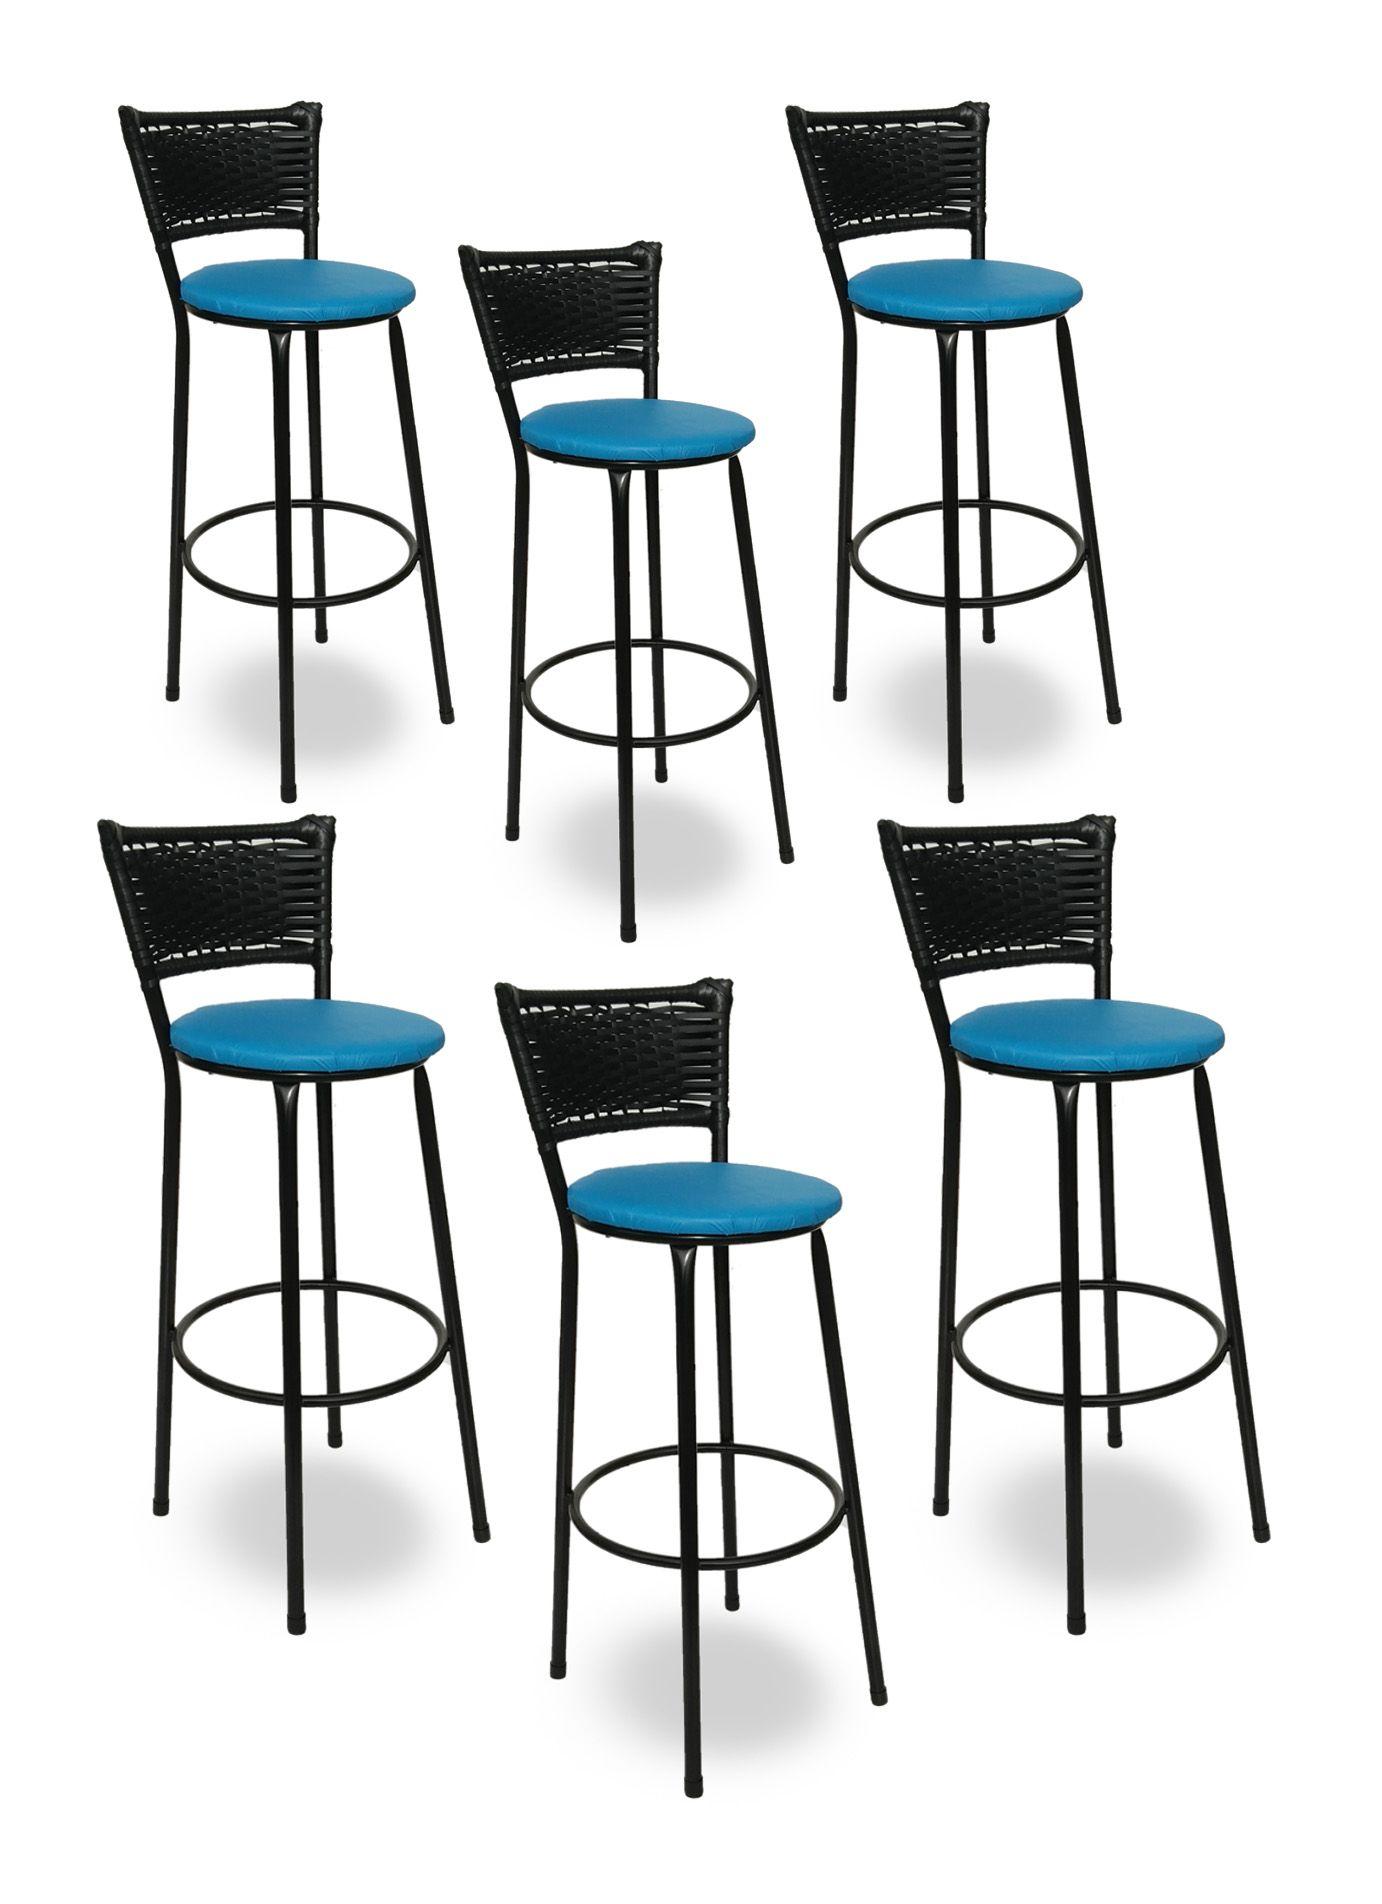 Kit 6 Banquetas Bistrô Hawaii Rattan Junco Preto Epóxi e Assento Azul